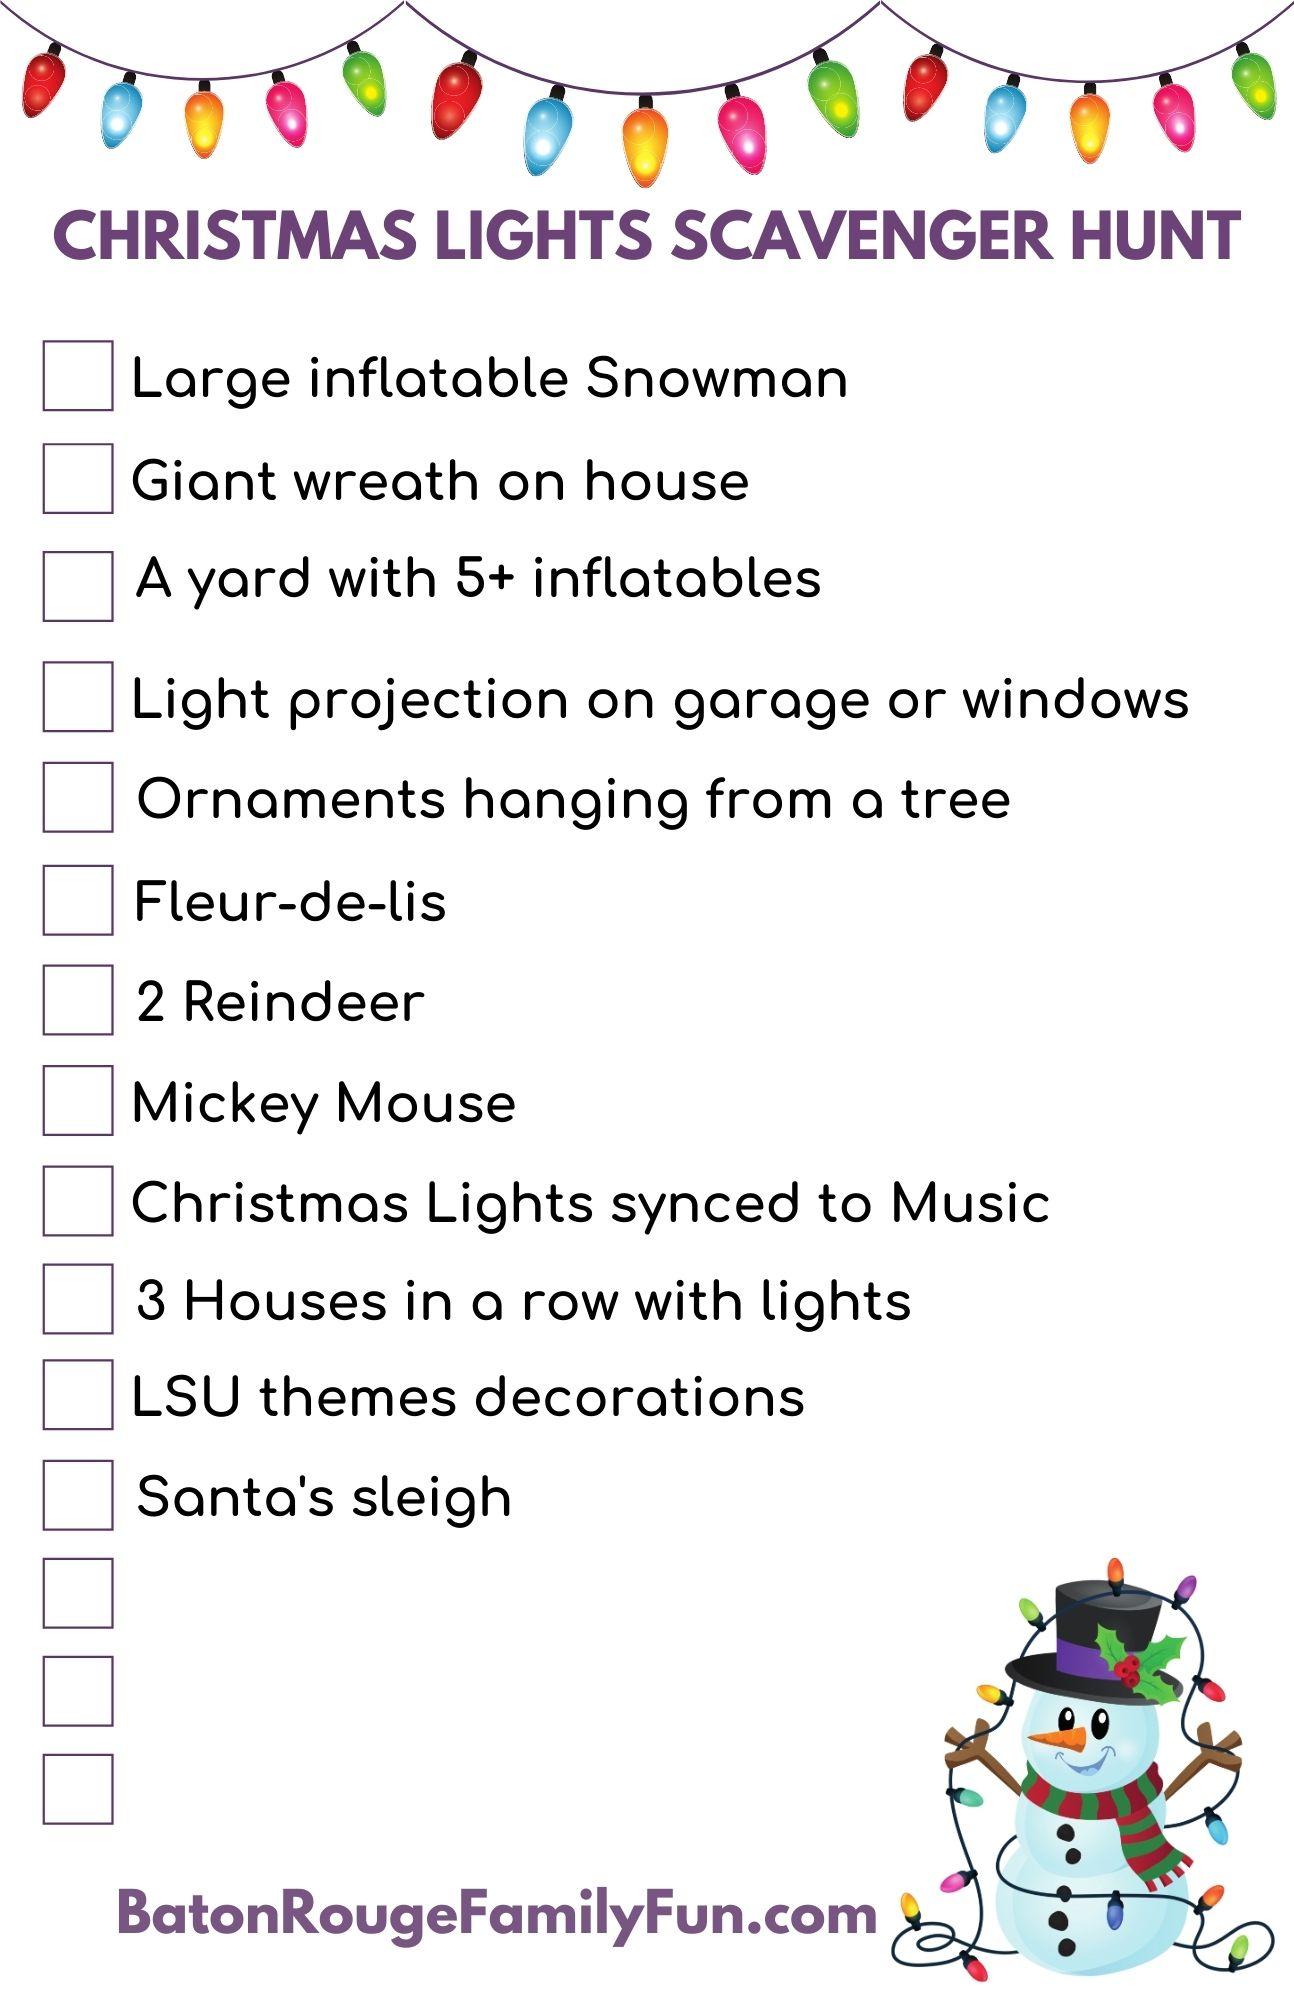 Christmas Lights Scavenger Hunt – Baton Rouge Family Fun